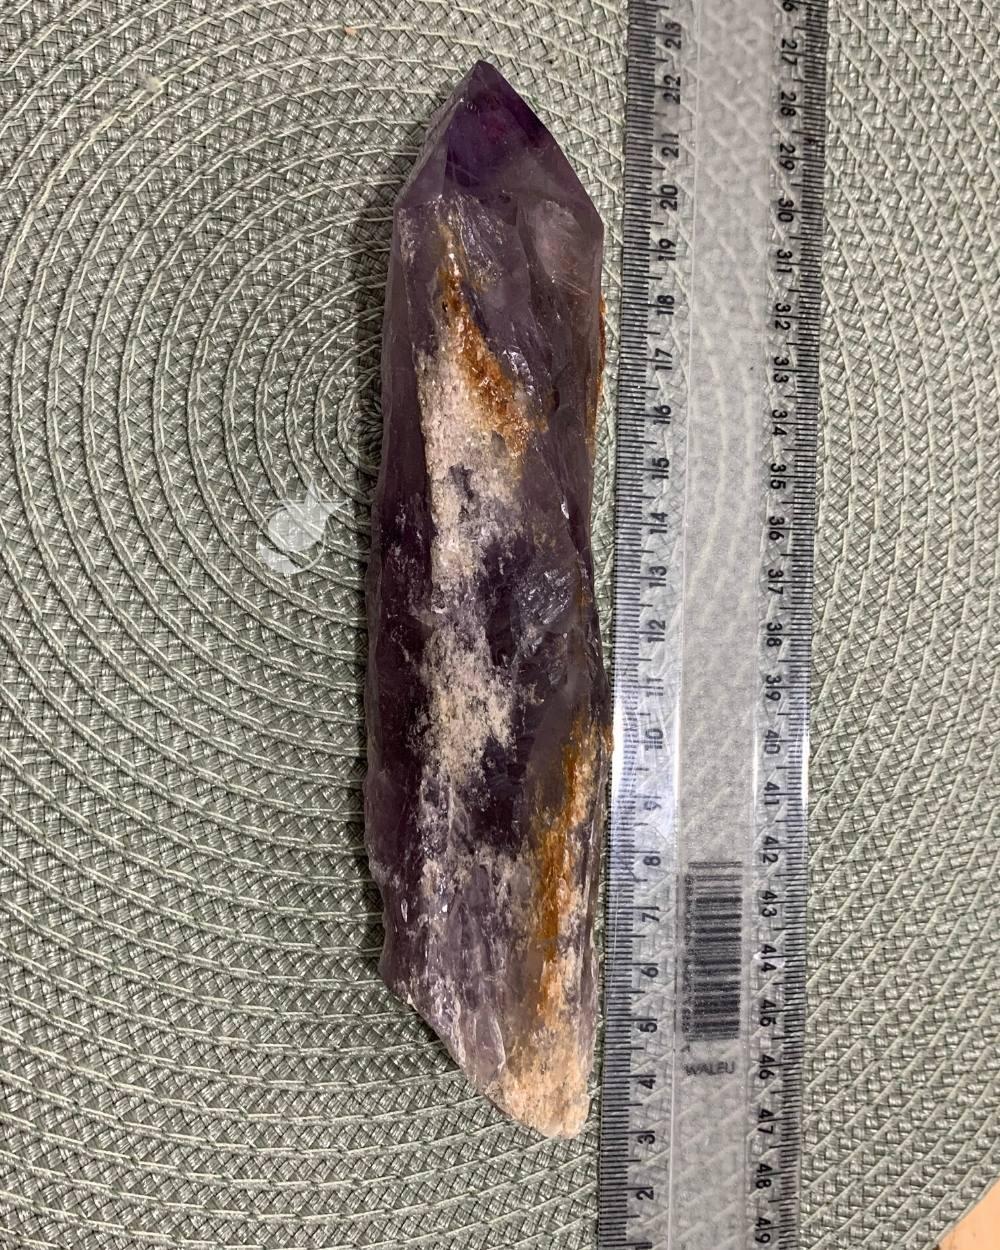 AMETISTA BRUTA - 17 cm (296g)